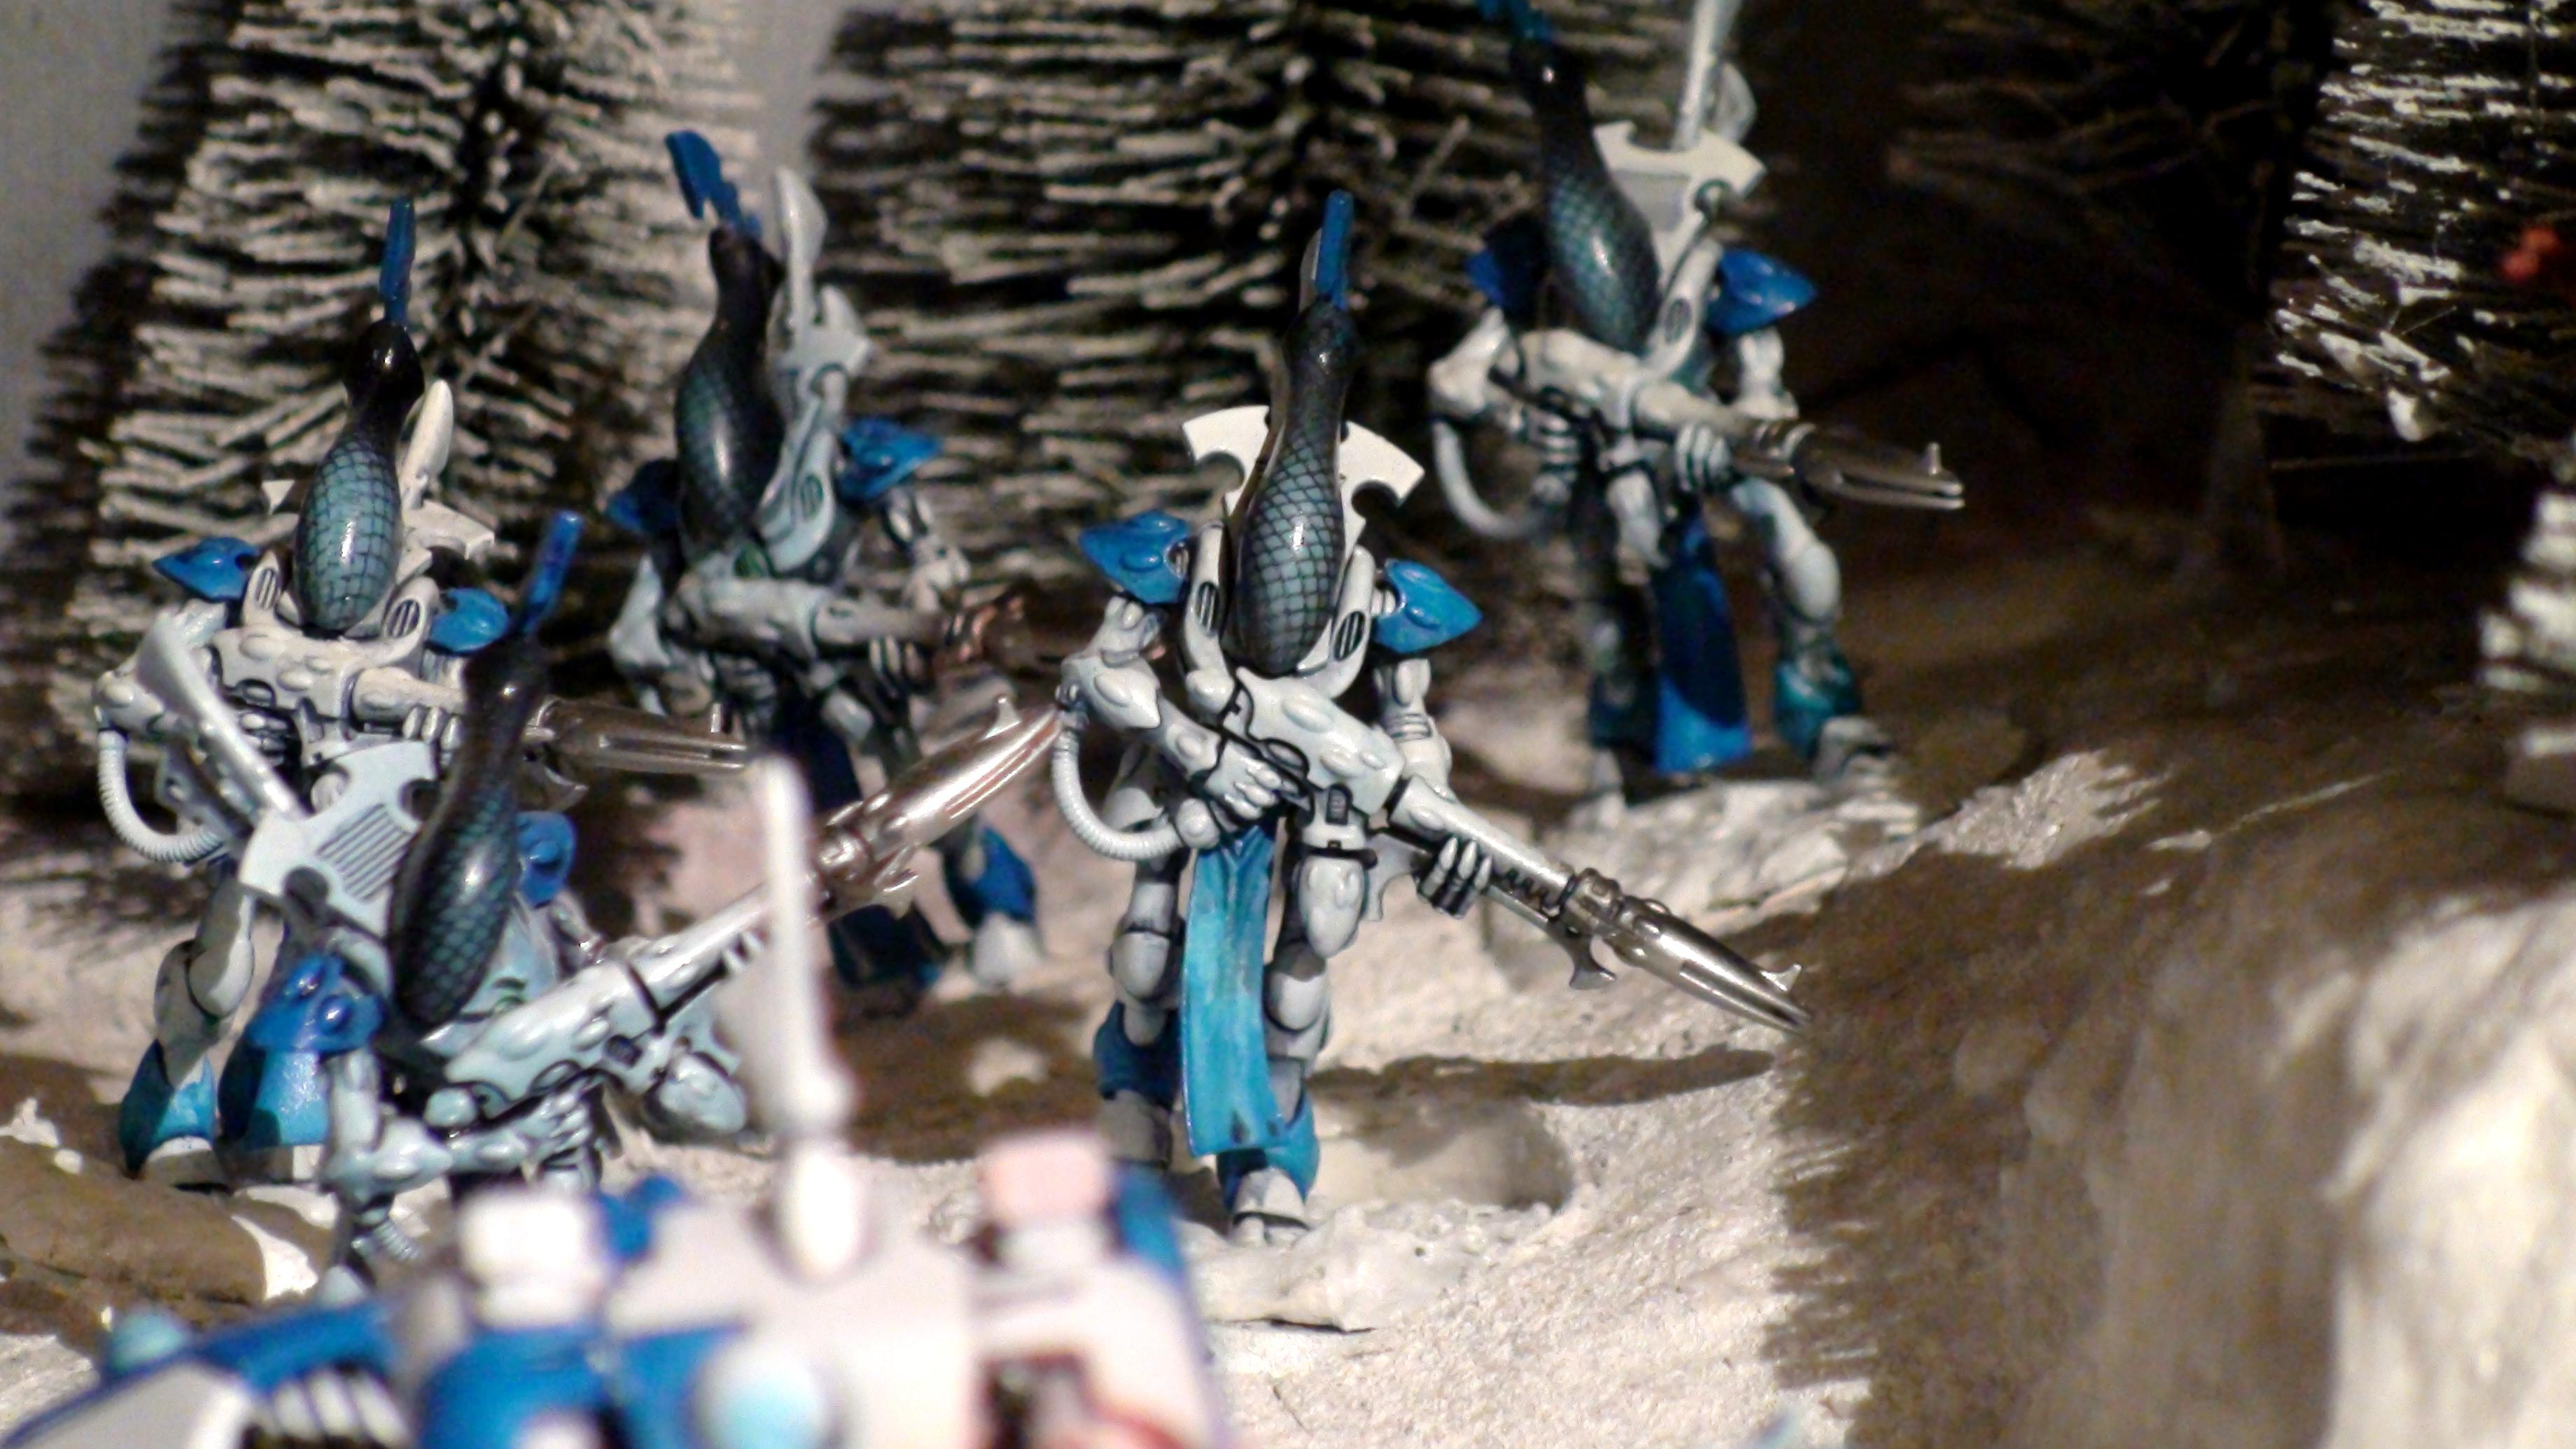 Army, Blue White, Diorama, Eldar, Eldar Wraith Army, Force, Forest, Forge World, Ghost, Host, Ilyrith, Iyanden, Iybraesil, Iybraezil, Phoenix Lord, Shadow, Snow, Spectres, Spirit, Spirit Host, Spirit Only, Warhammer 40,000, Warhammer Fantasy, Waveserpent, Winter, Wraith, Wraith Host, Wraith Only, Wraithguard, Wraithknight, Wraithknights, Wraithlord